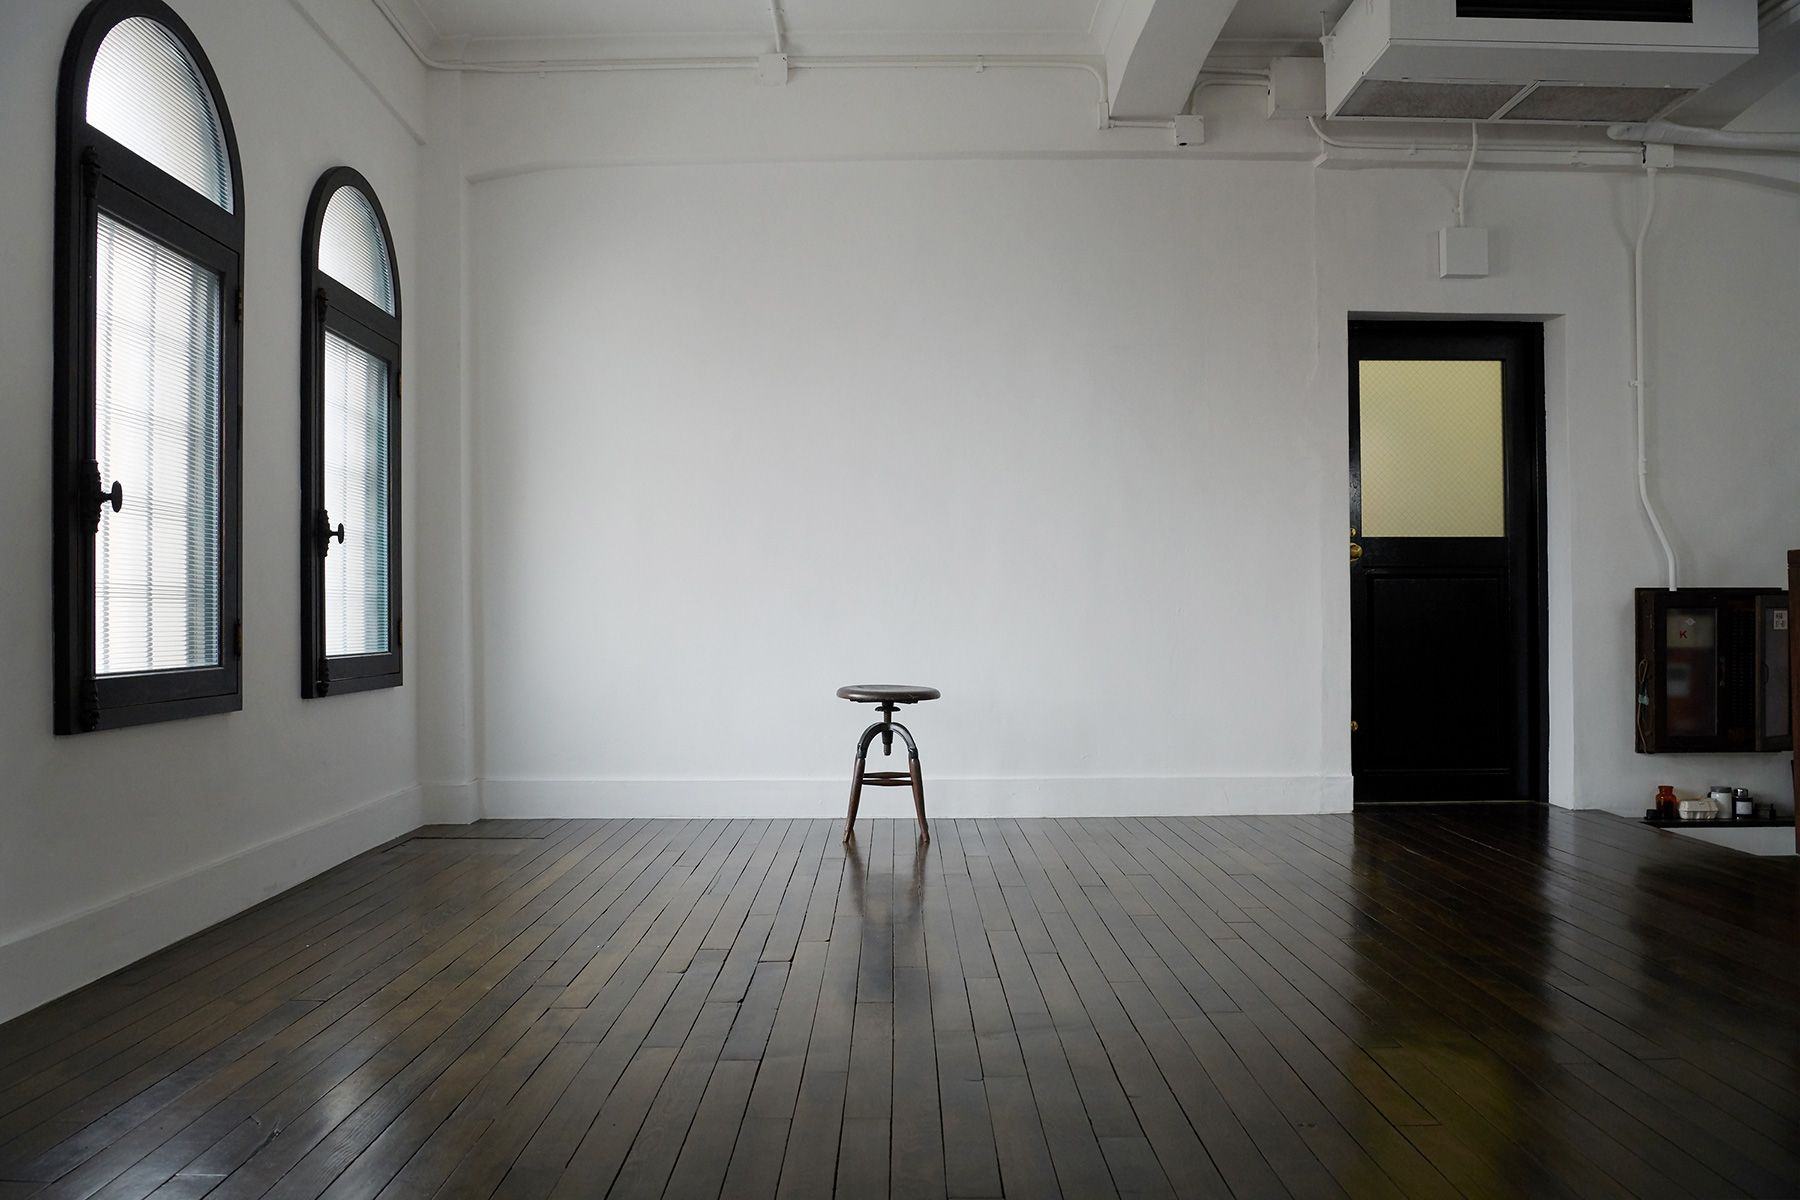 BLANK (ブランク)4階 天井高3m20cmの広い白壁